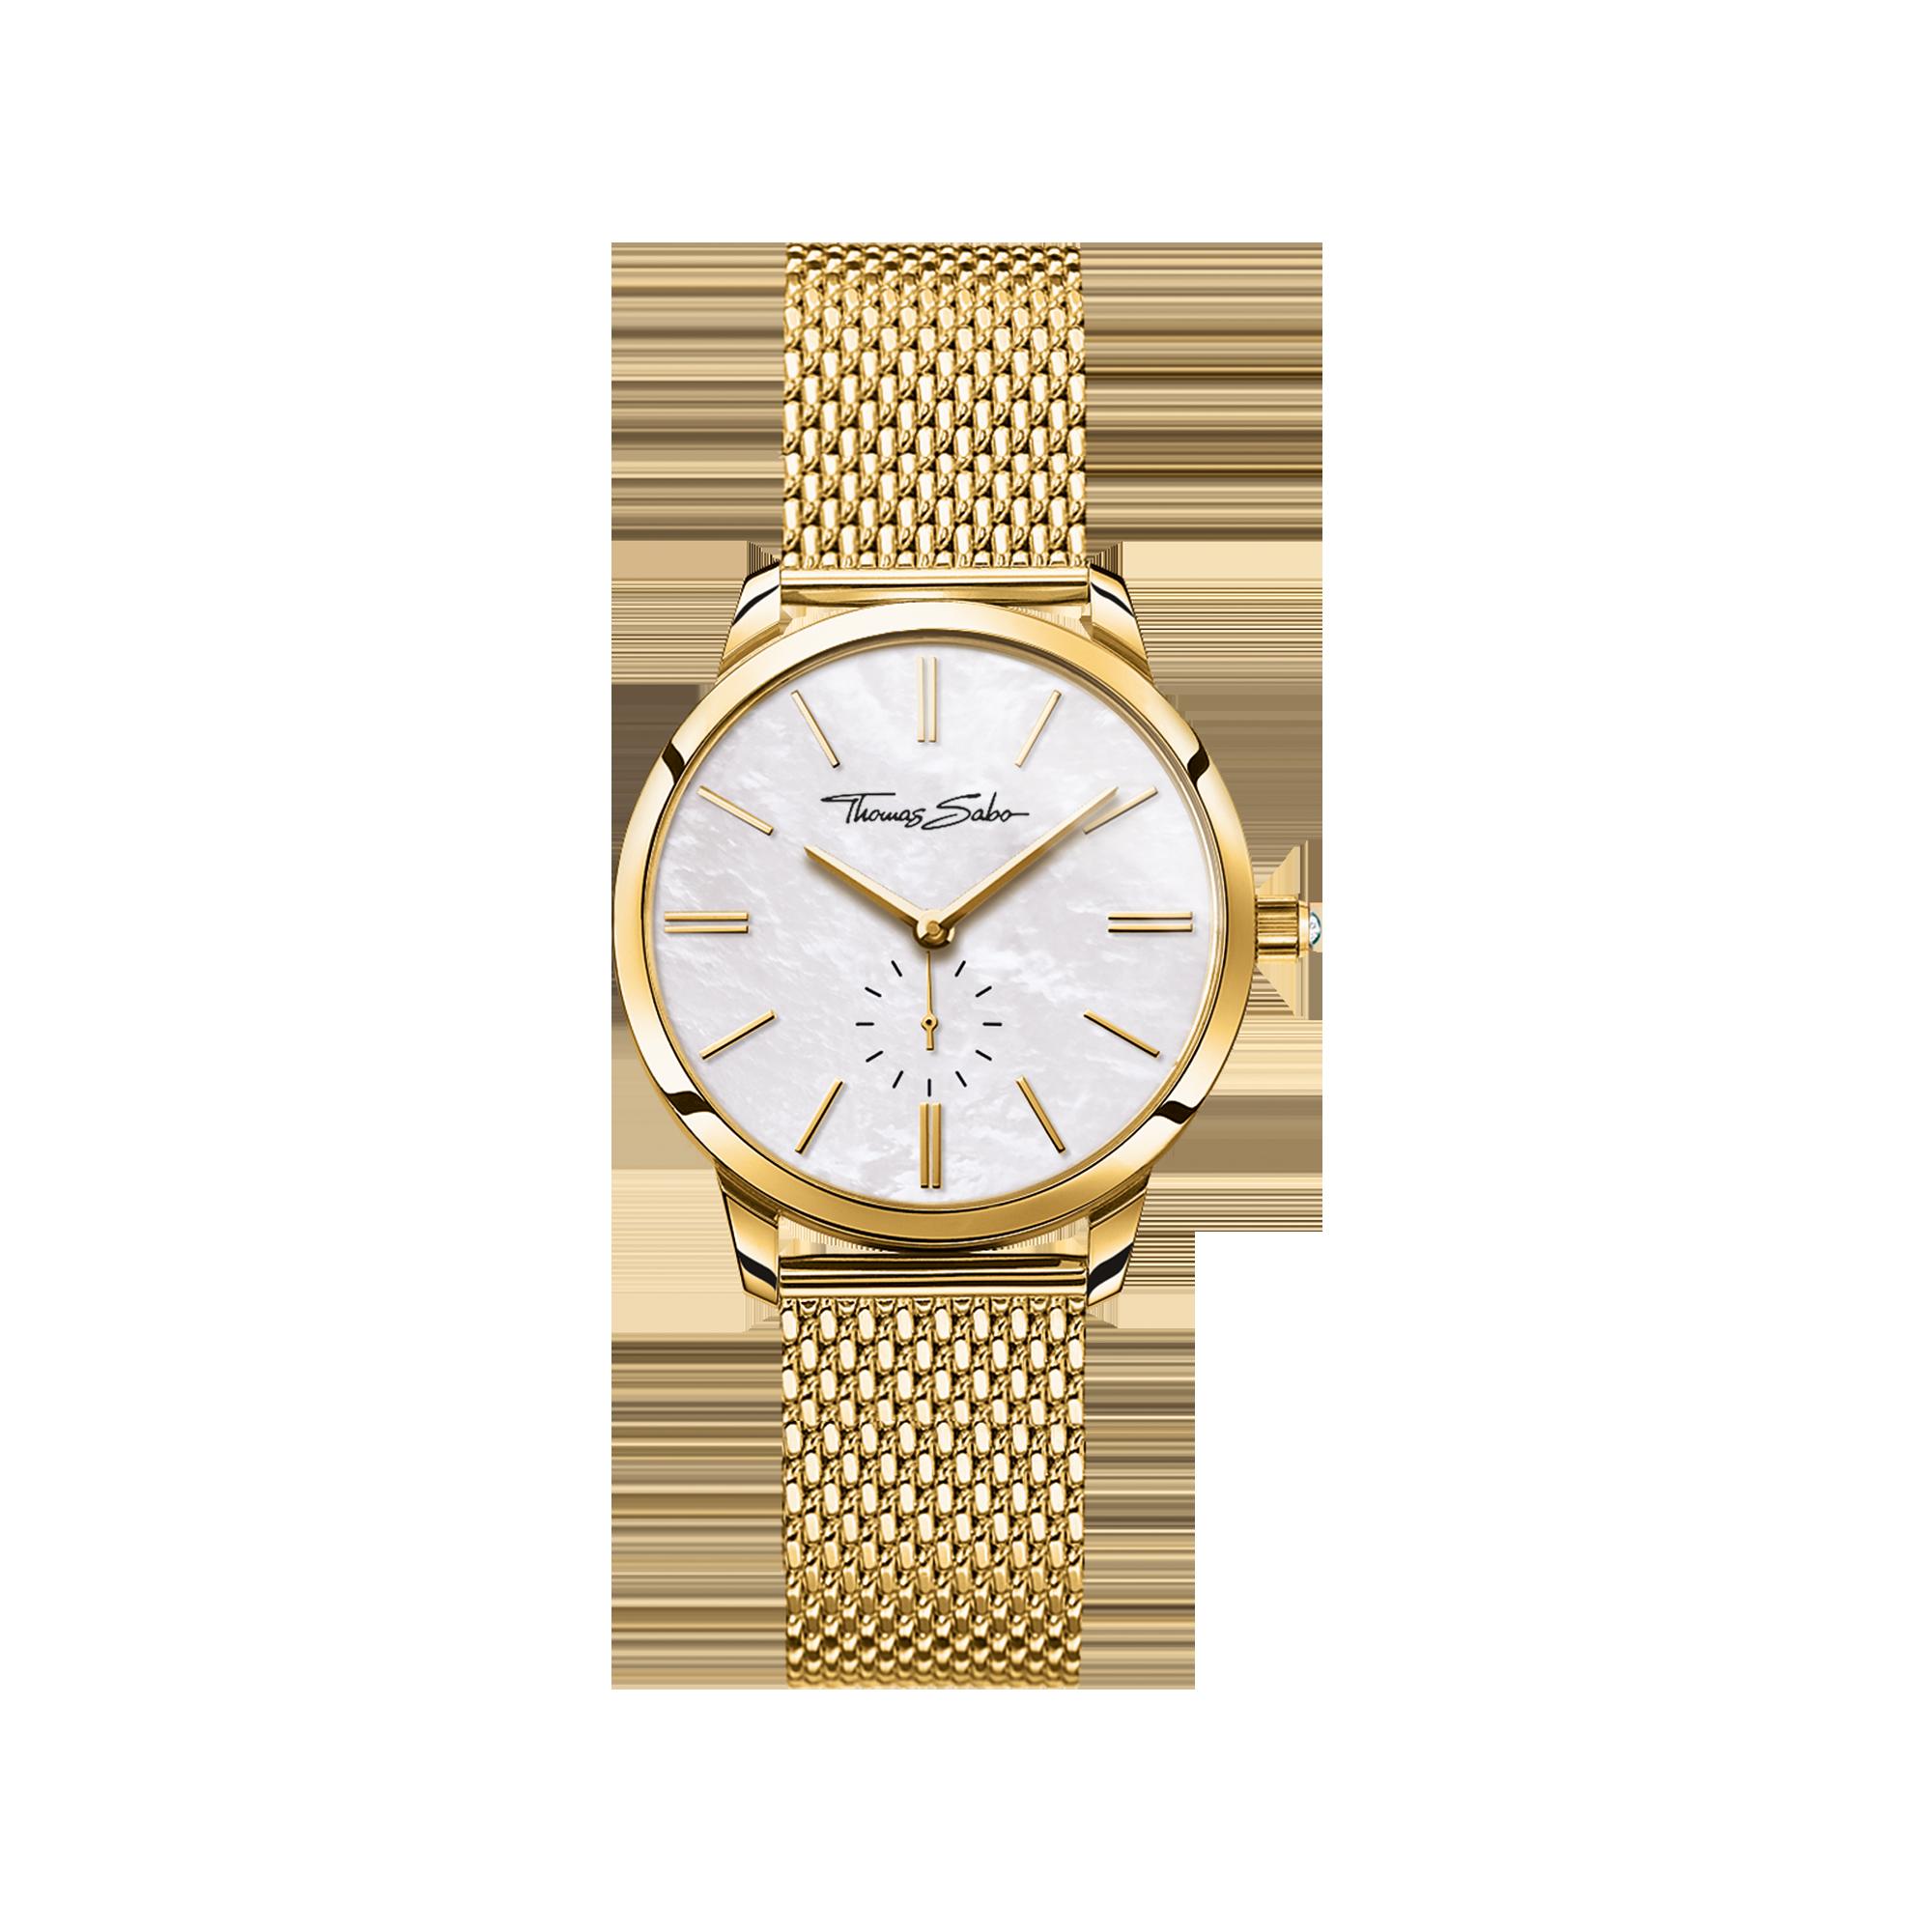 Thomas Sabo - women's watch - 1